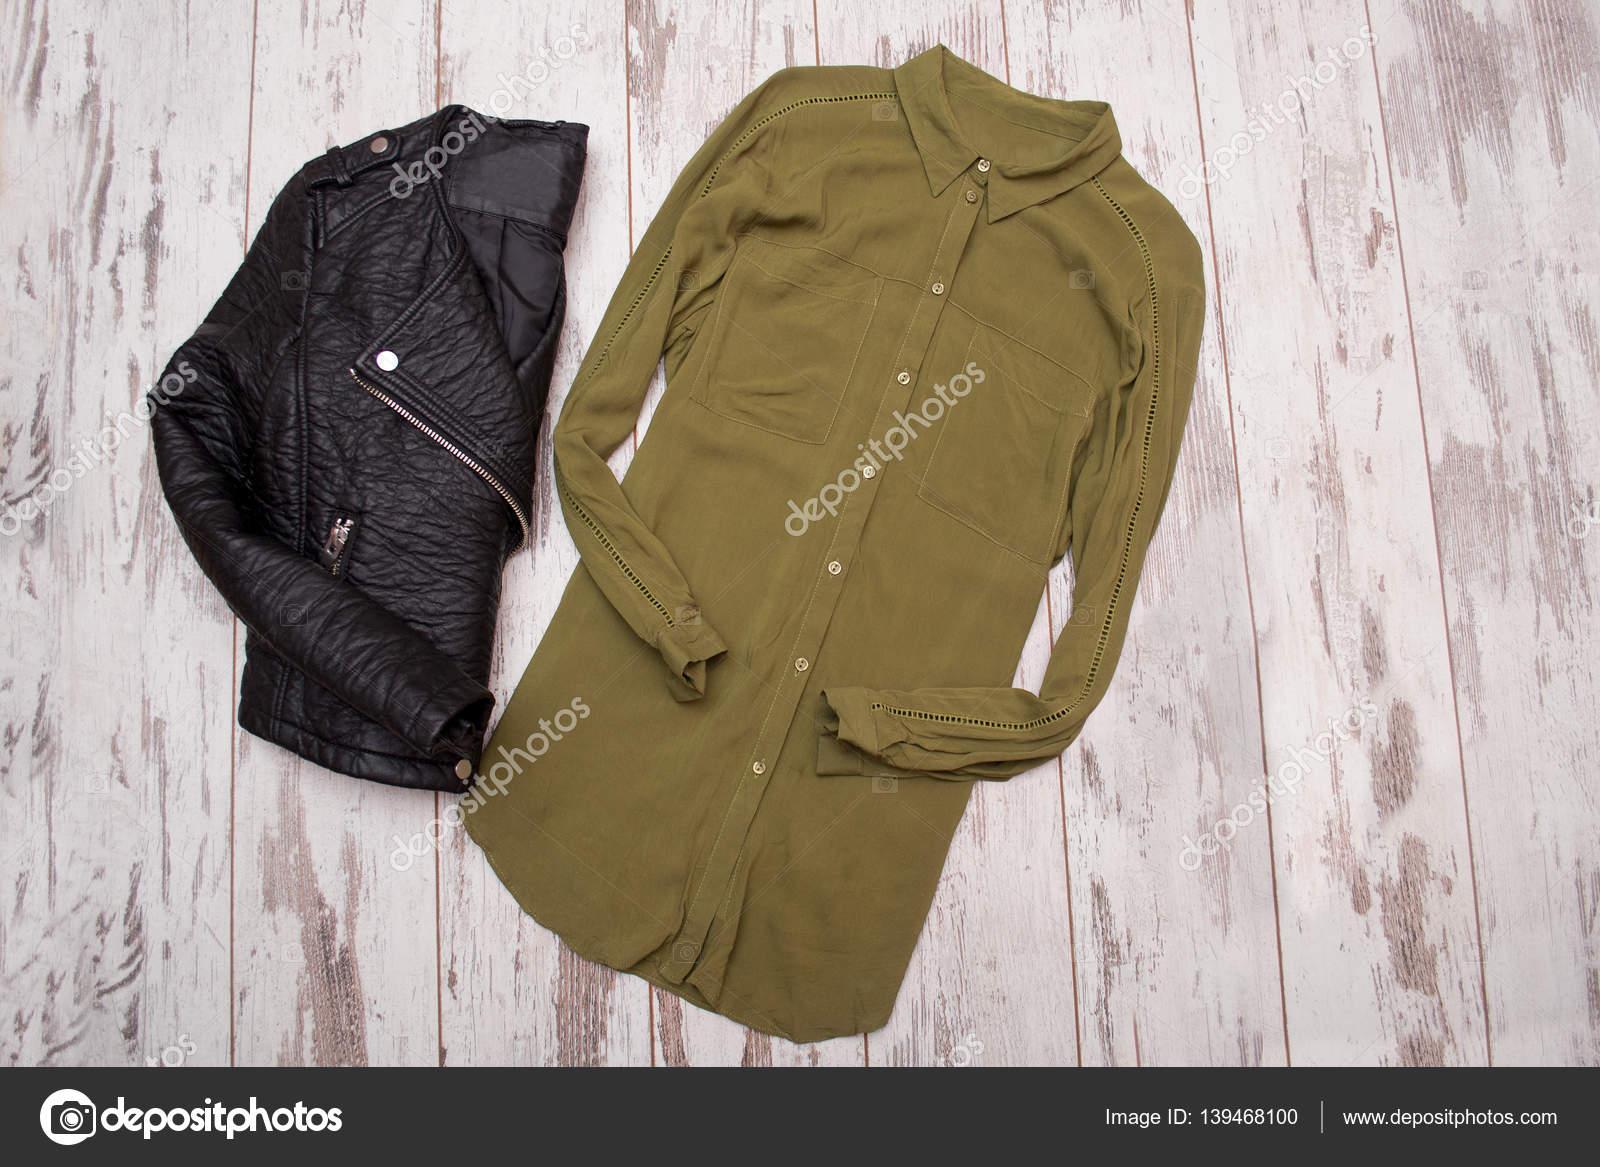 A giacca e pelle testo